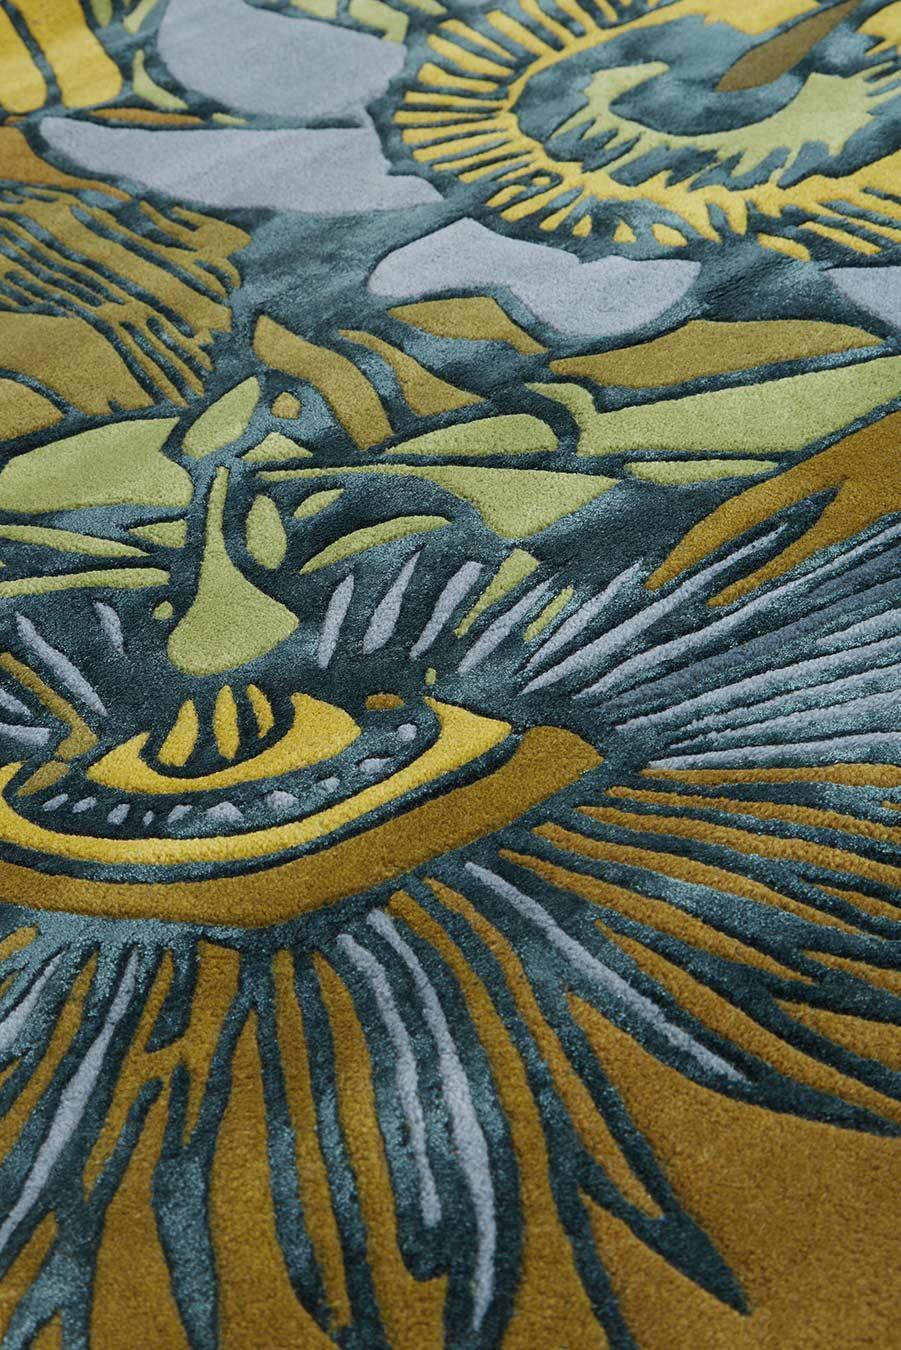 Close up image of floral Wailoa rug